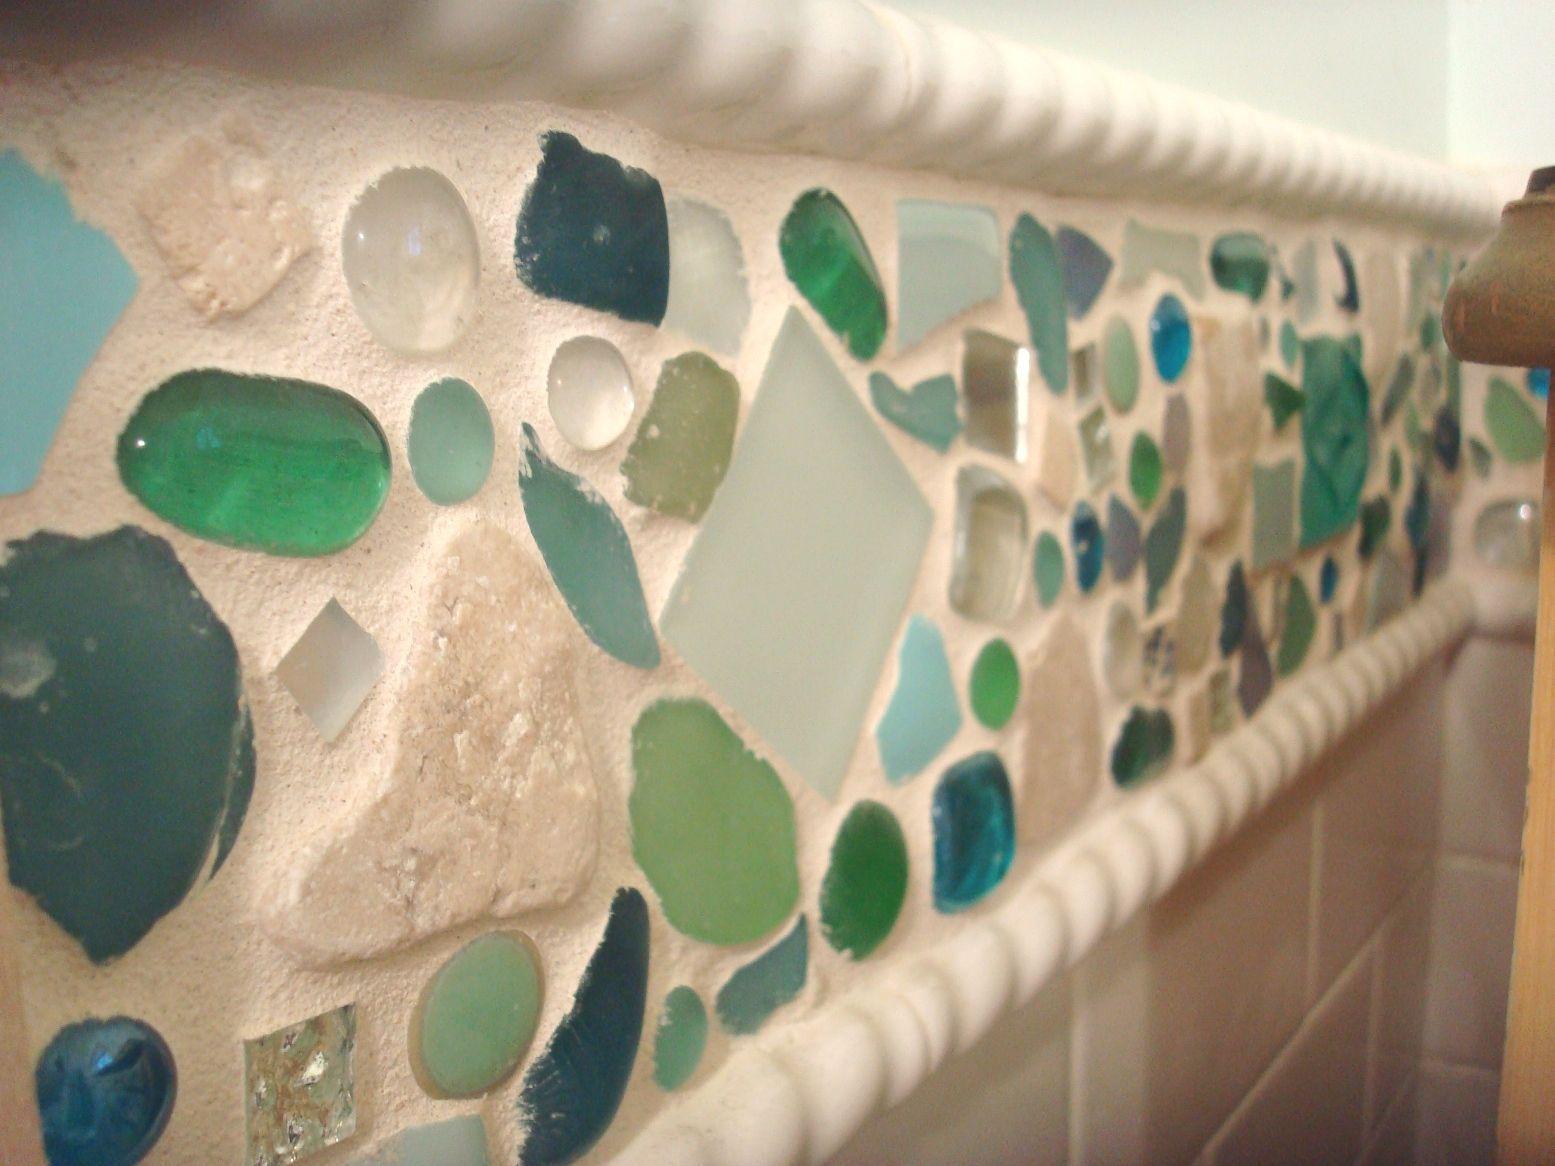 Sea Glass Art Of Seahorse Seahorse Wall Hanging Beach Bathroom Decor Sea Horse Beach House Wall Decor Coastal Decor Nautical Decor Beach House Wall Decor Sea Glass Art Beach Bathroom Decor